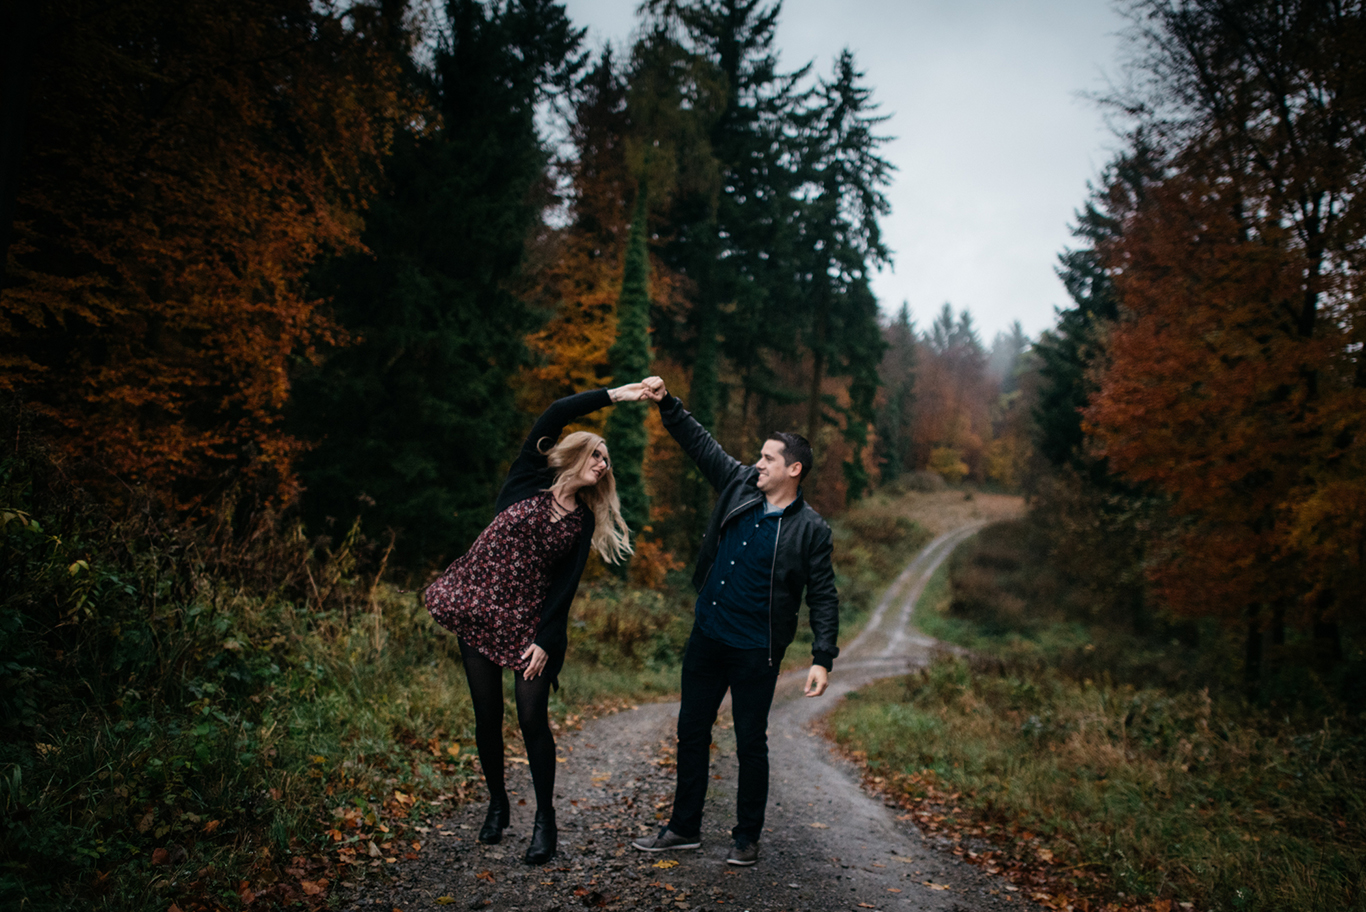 Gallerie | Verliebt Verlobt 30